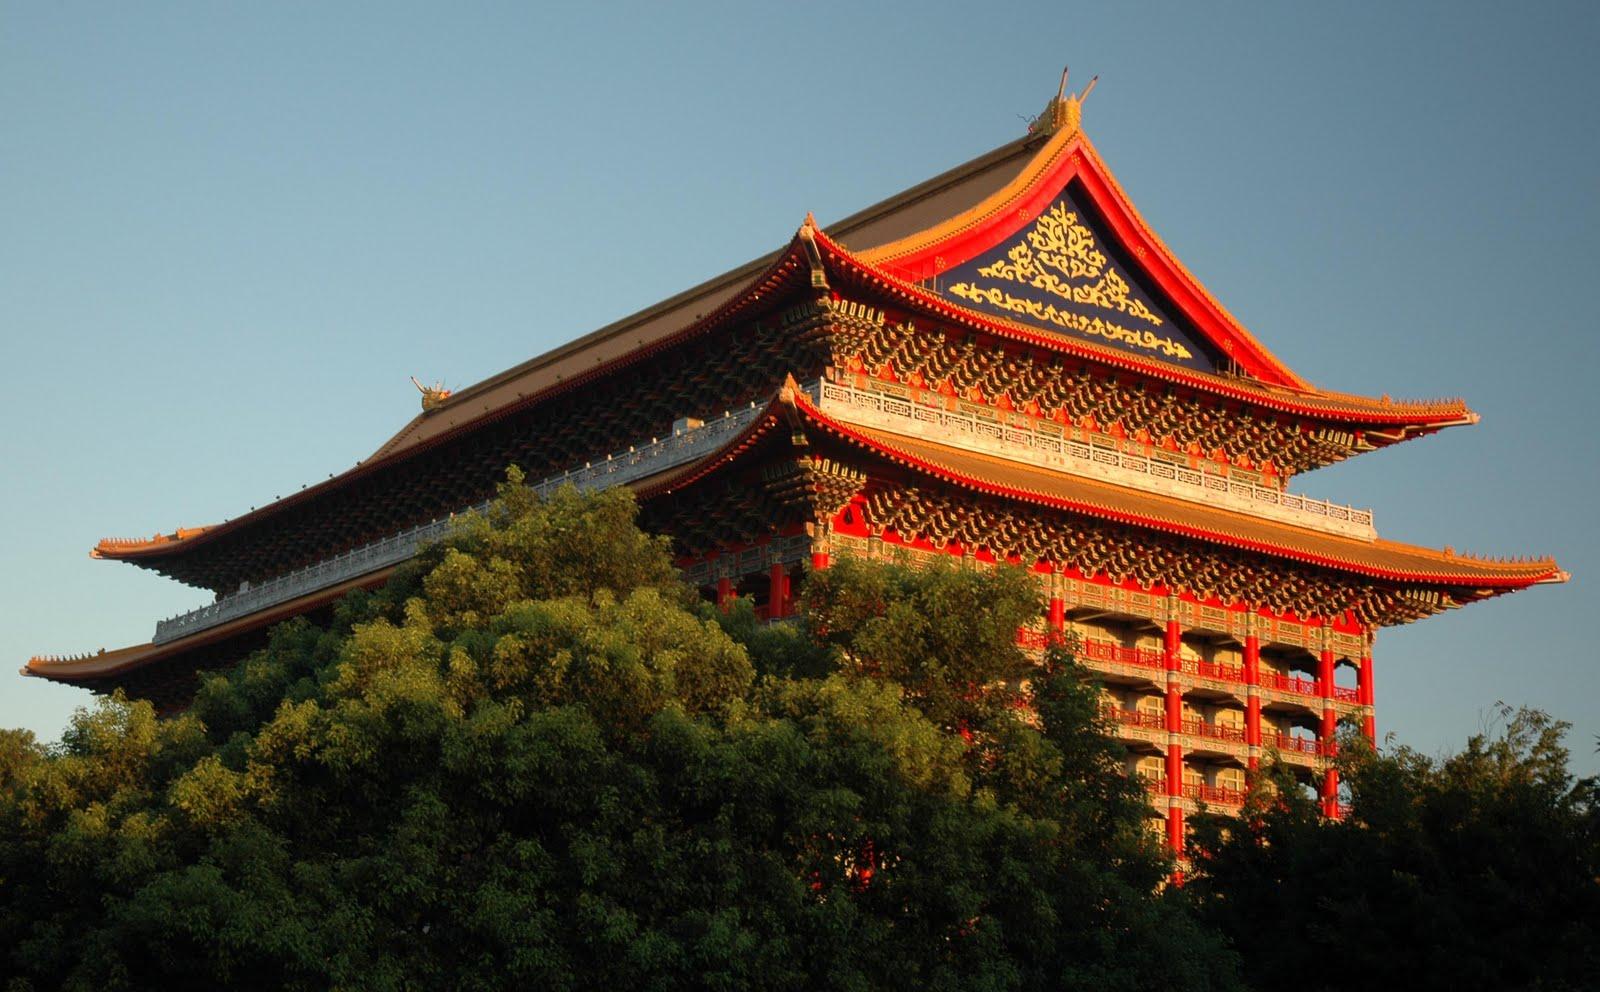 The Taiwan Adventure Taiwan Travelogue The Grand Hotel